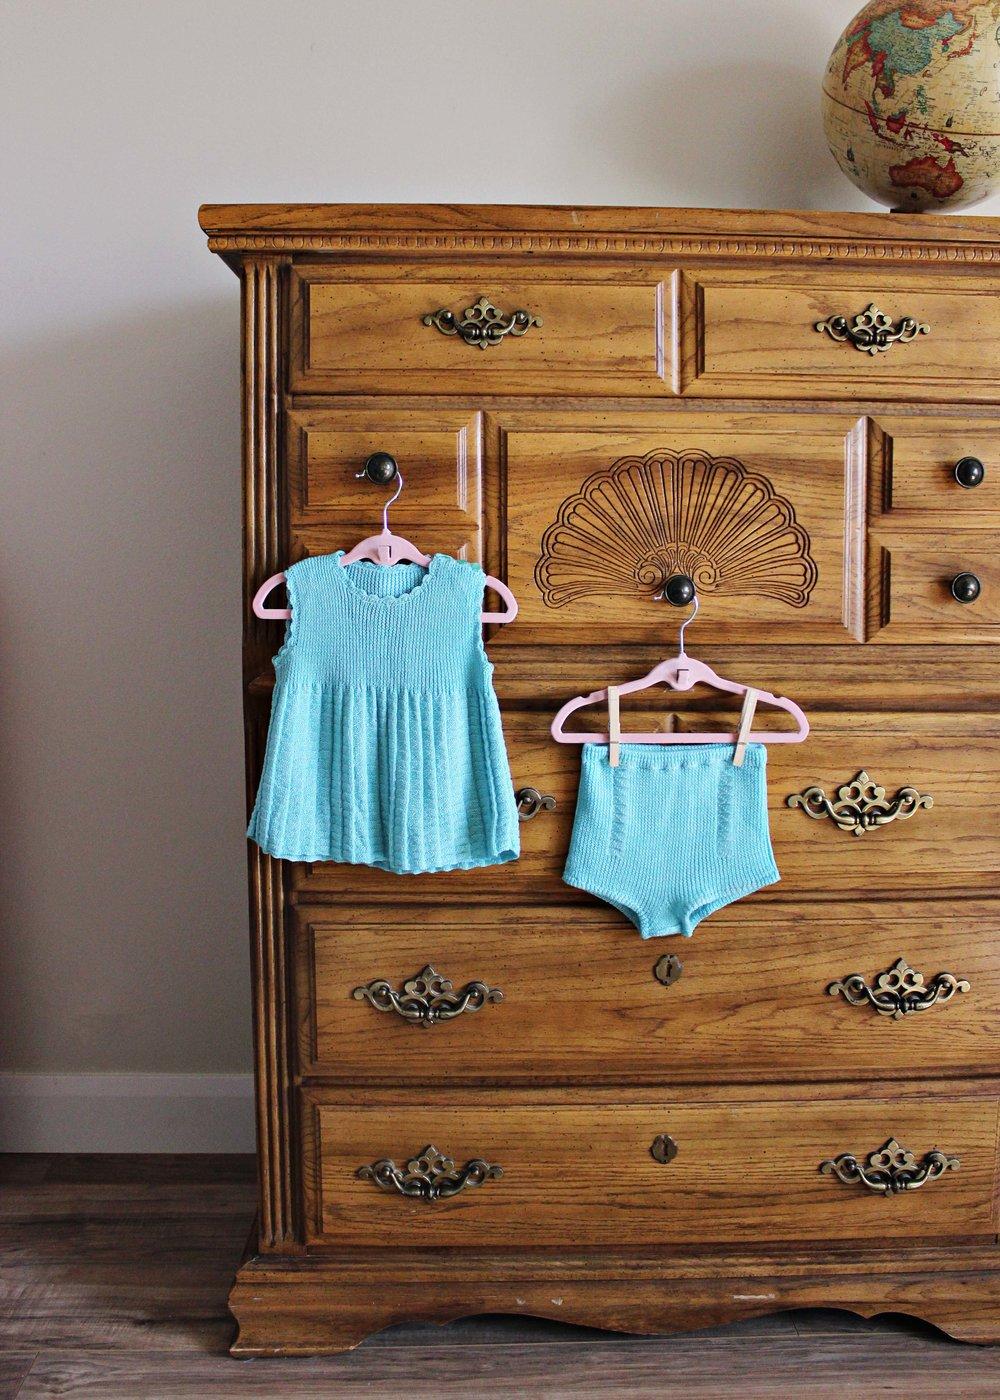 family heirloom knit dress // via www.darlingbebrave.com